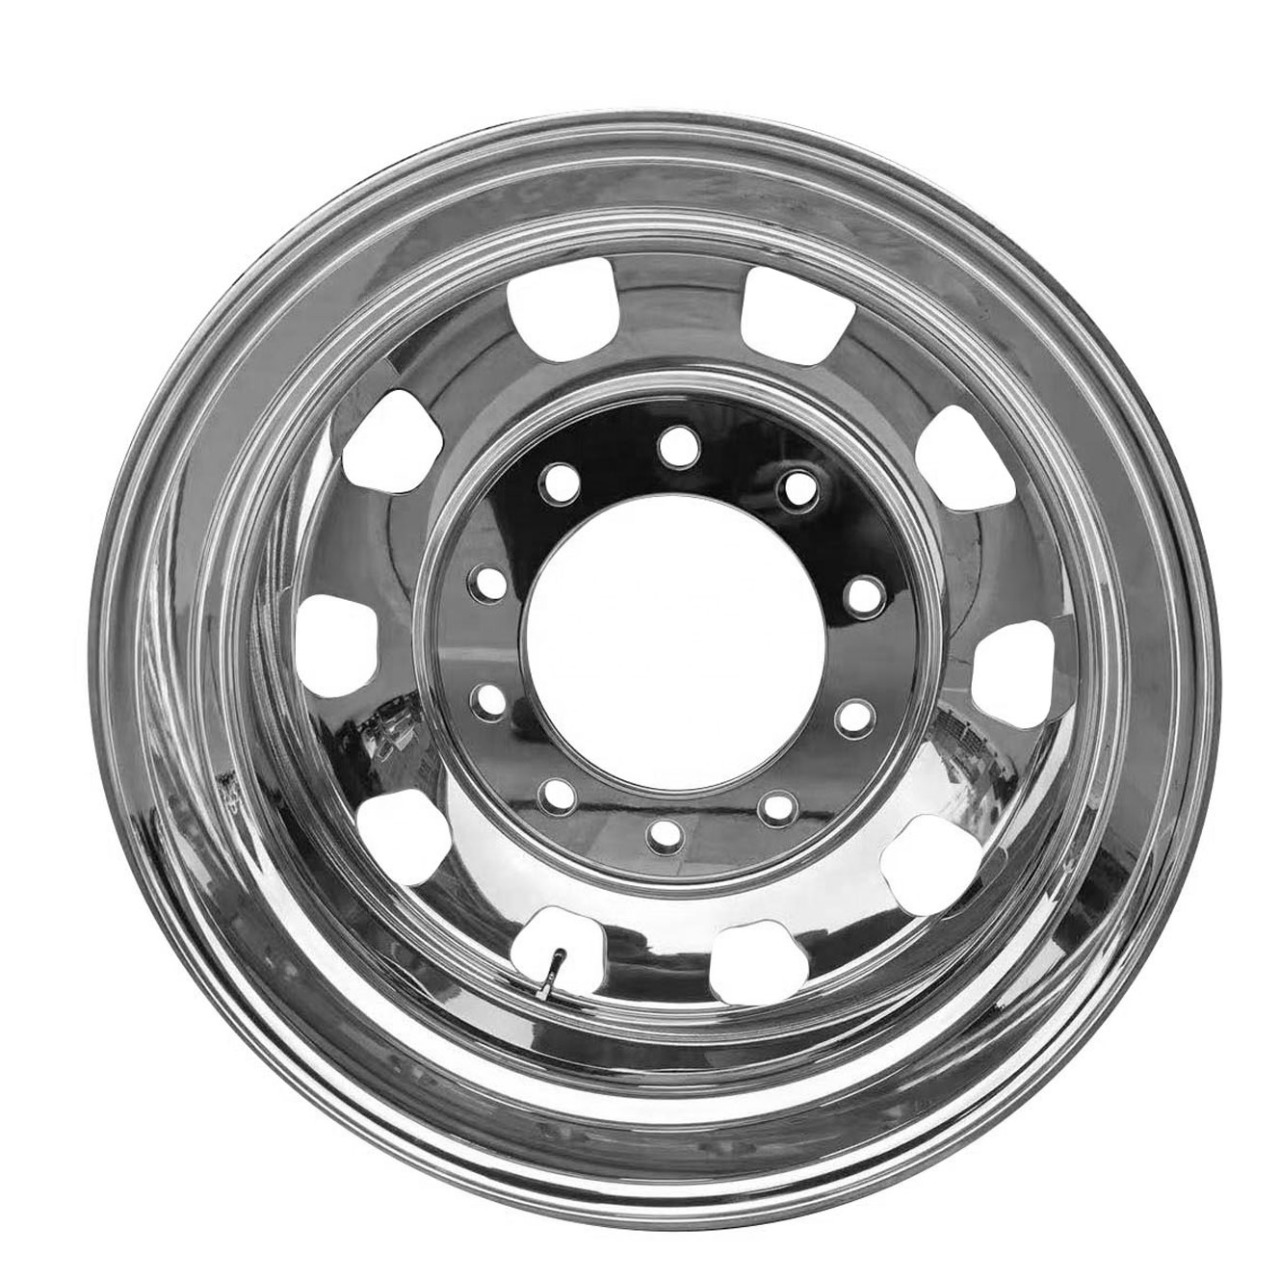 Roda de Alumínio Caminhão Speedline Borda Larga Alto Brilho Aro 22,5 X 8,25